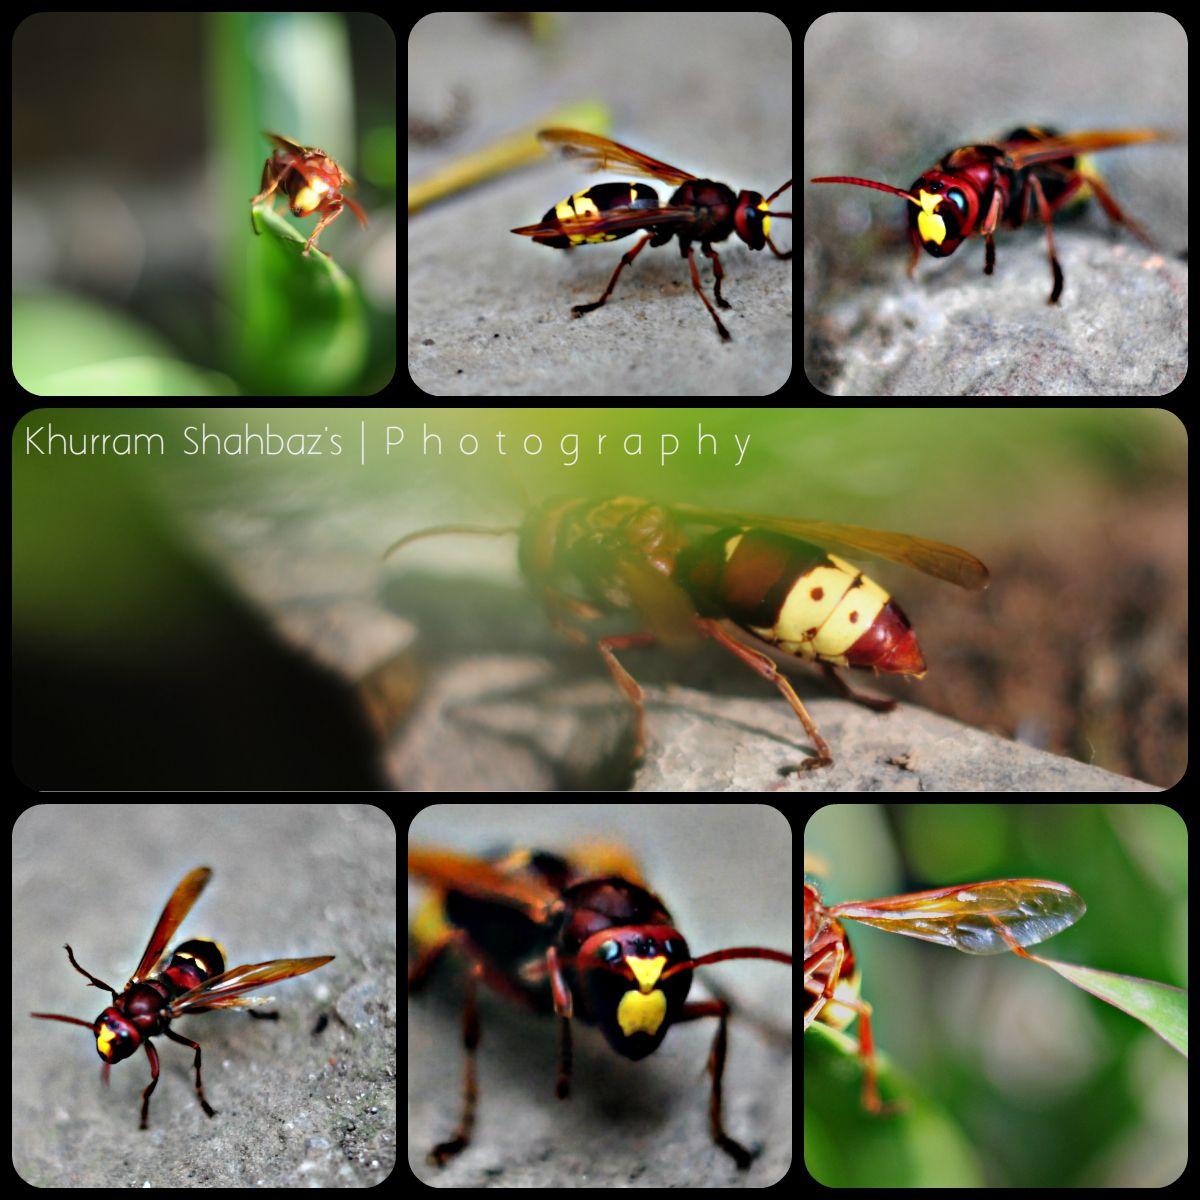 Polistes - Paper Wasp.  Nikon D5000,  50mm 1.8D +2 Diopter Closeup Filter.